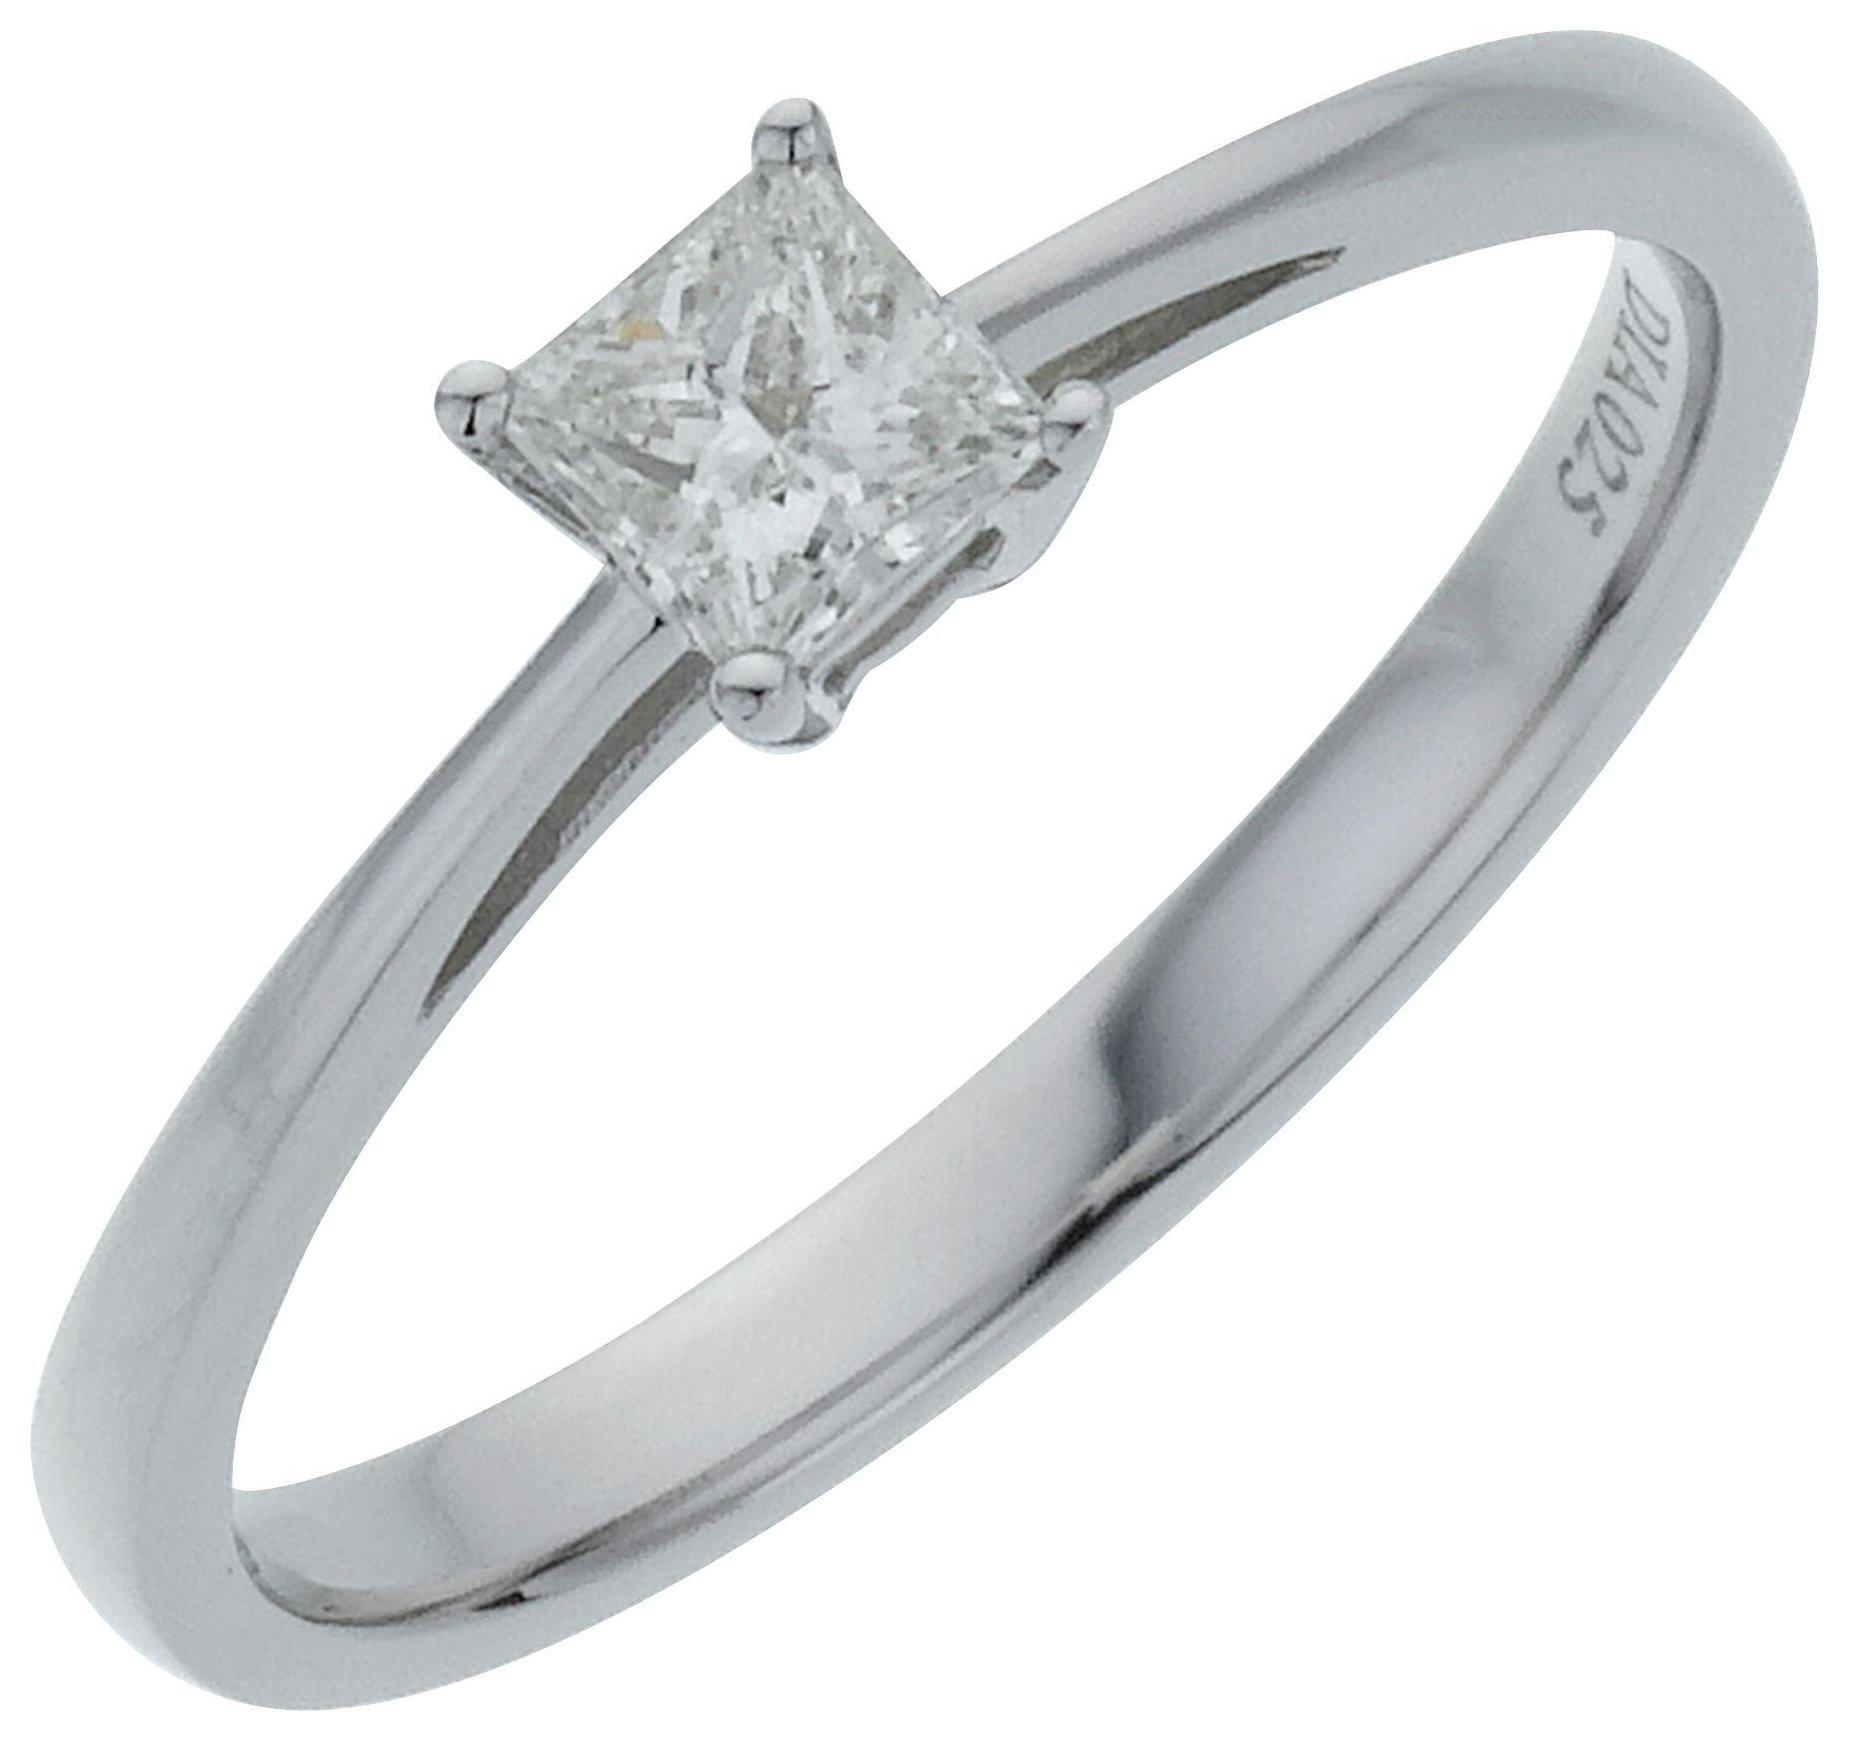 18 Carat White Gold 025 Carat Diamond - Princess Cut Diamond - Ring - W